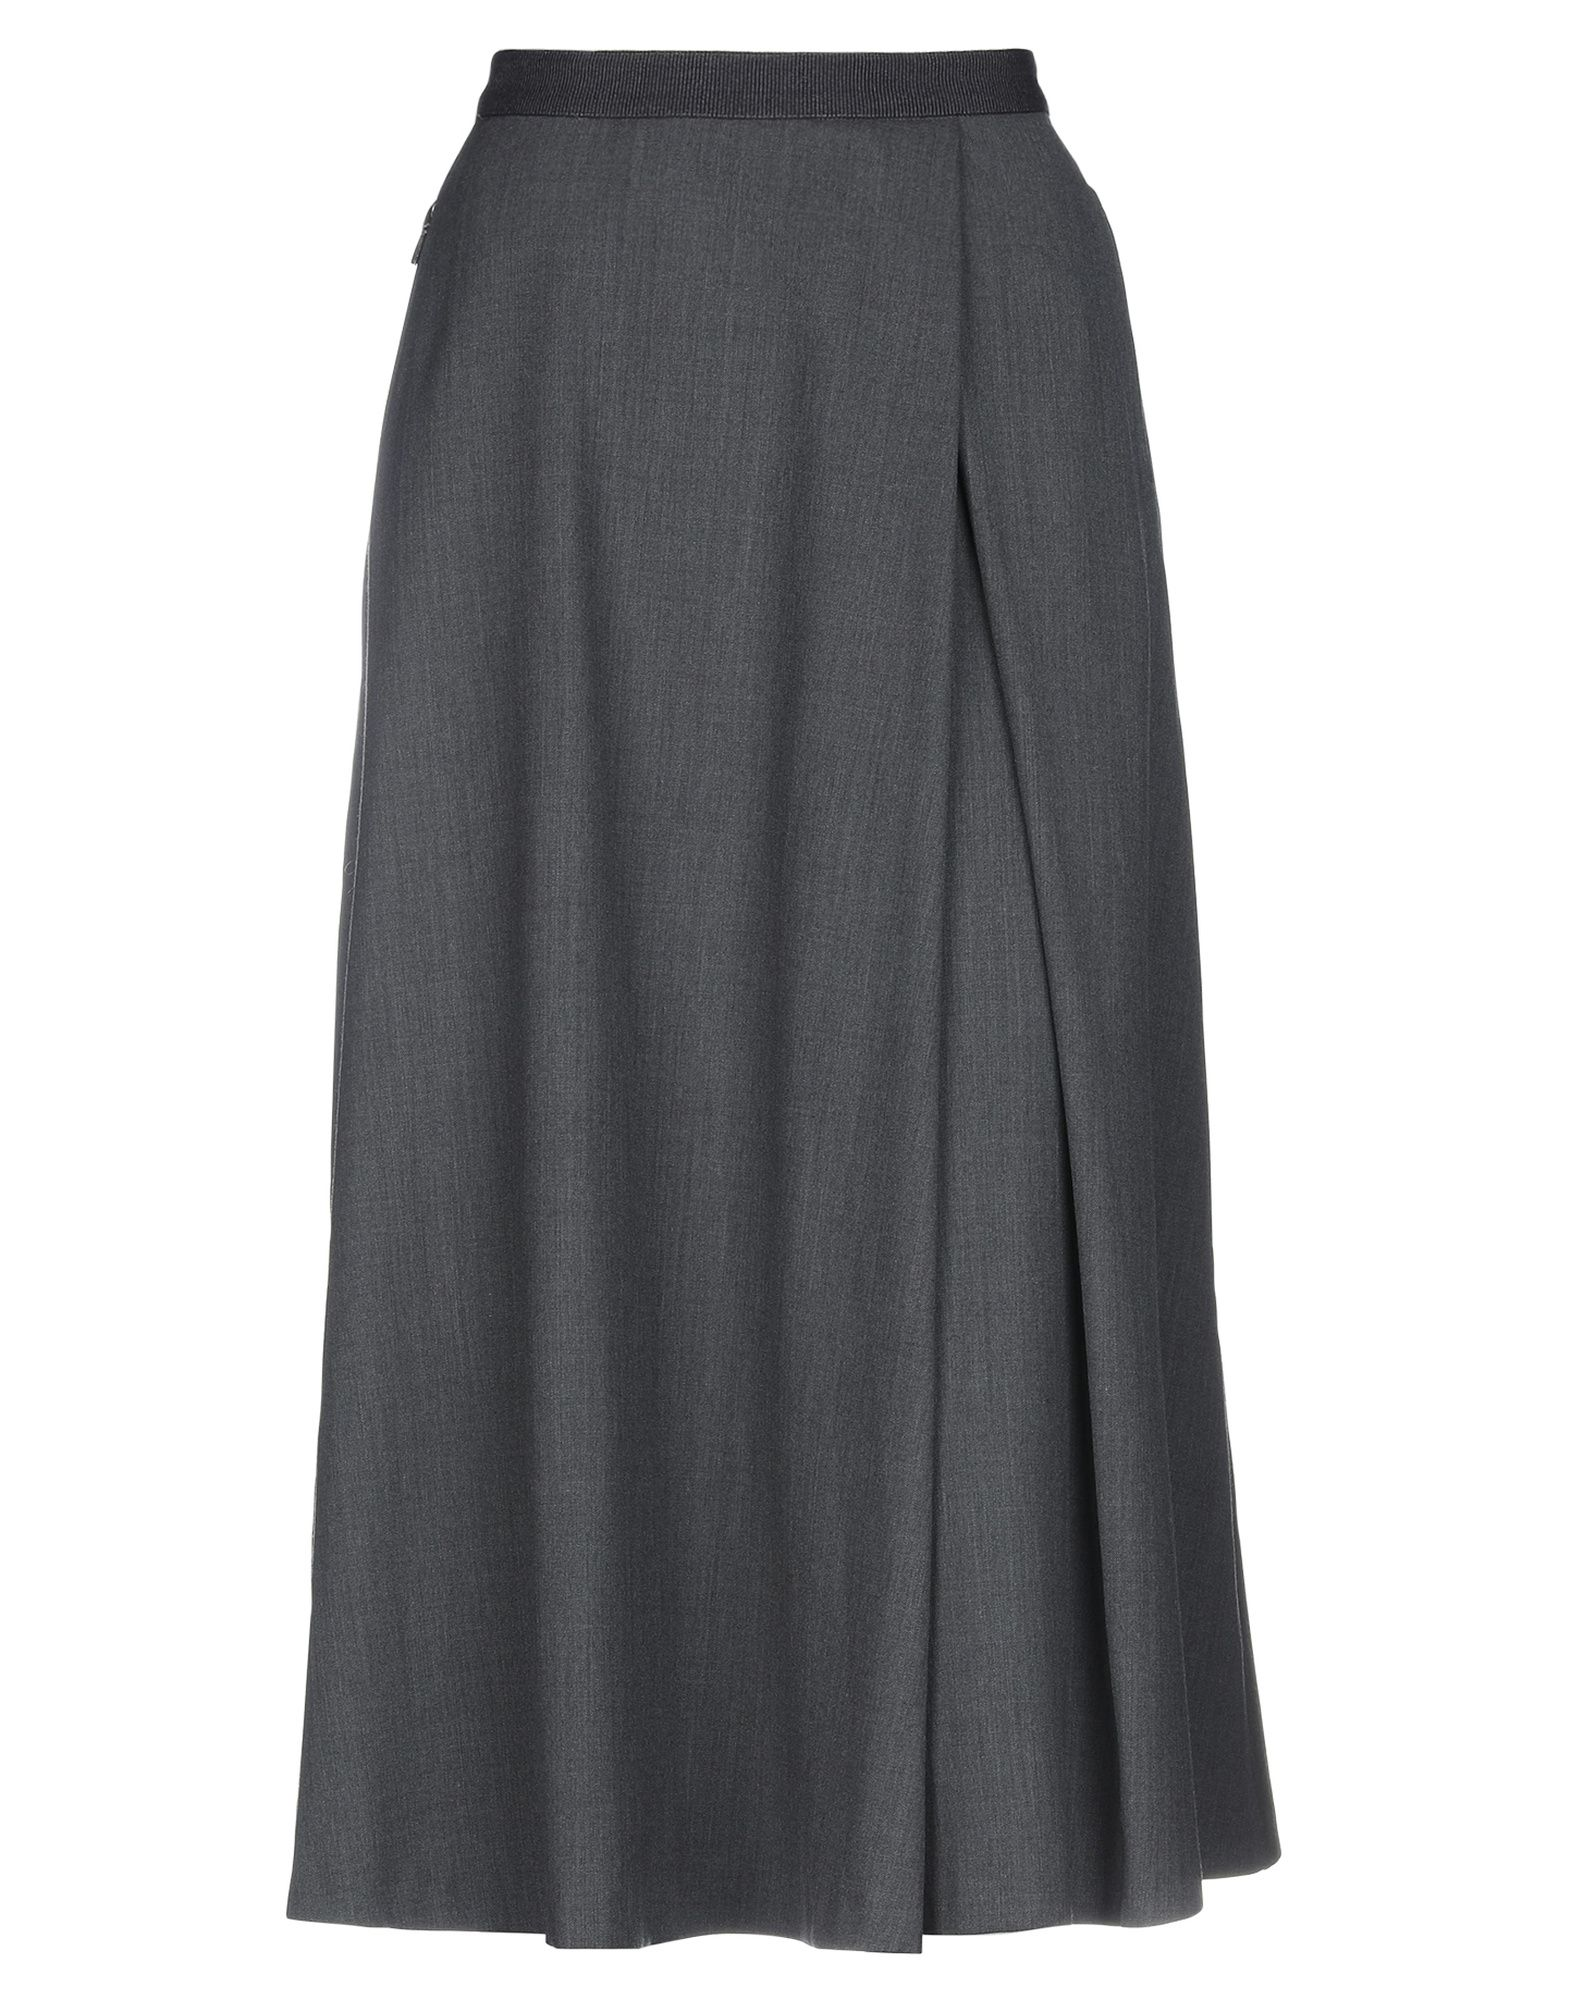 WEEKEND MAX MARA Юбка длиной 3/4 юбка max mara weekend юбка